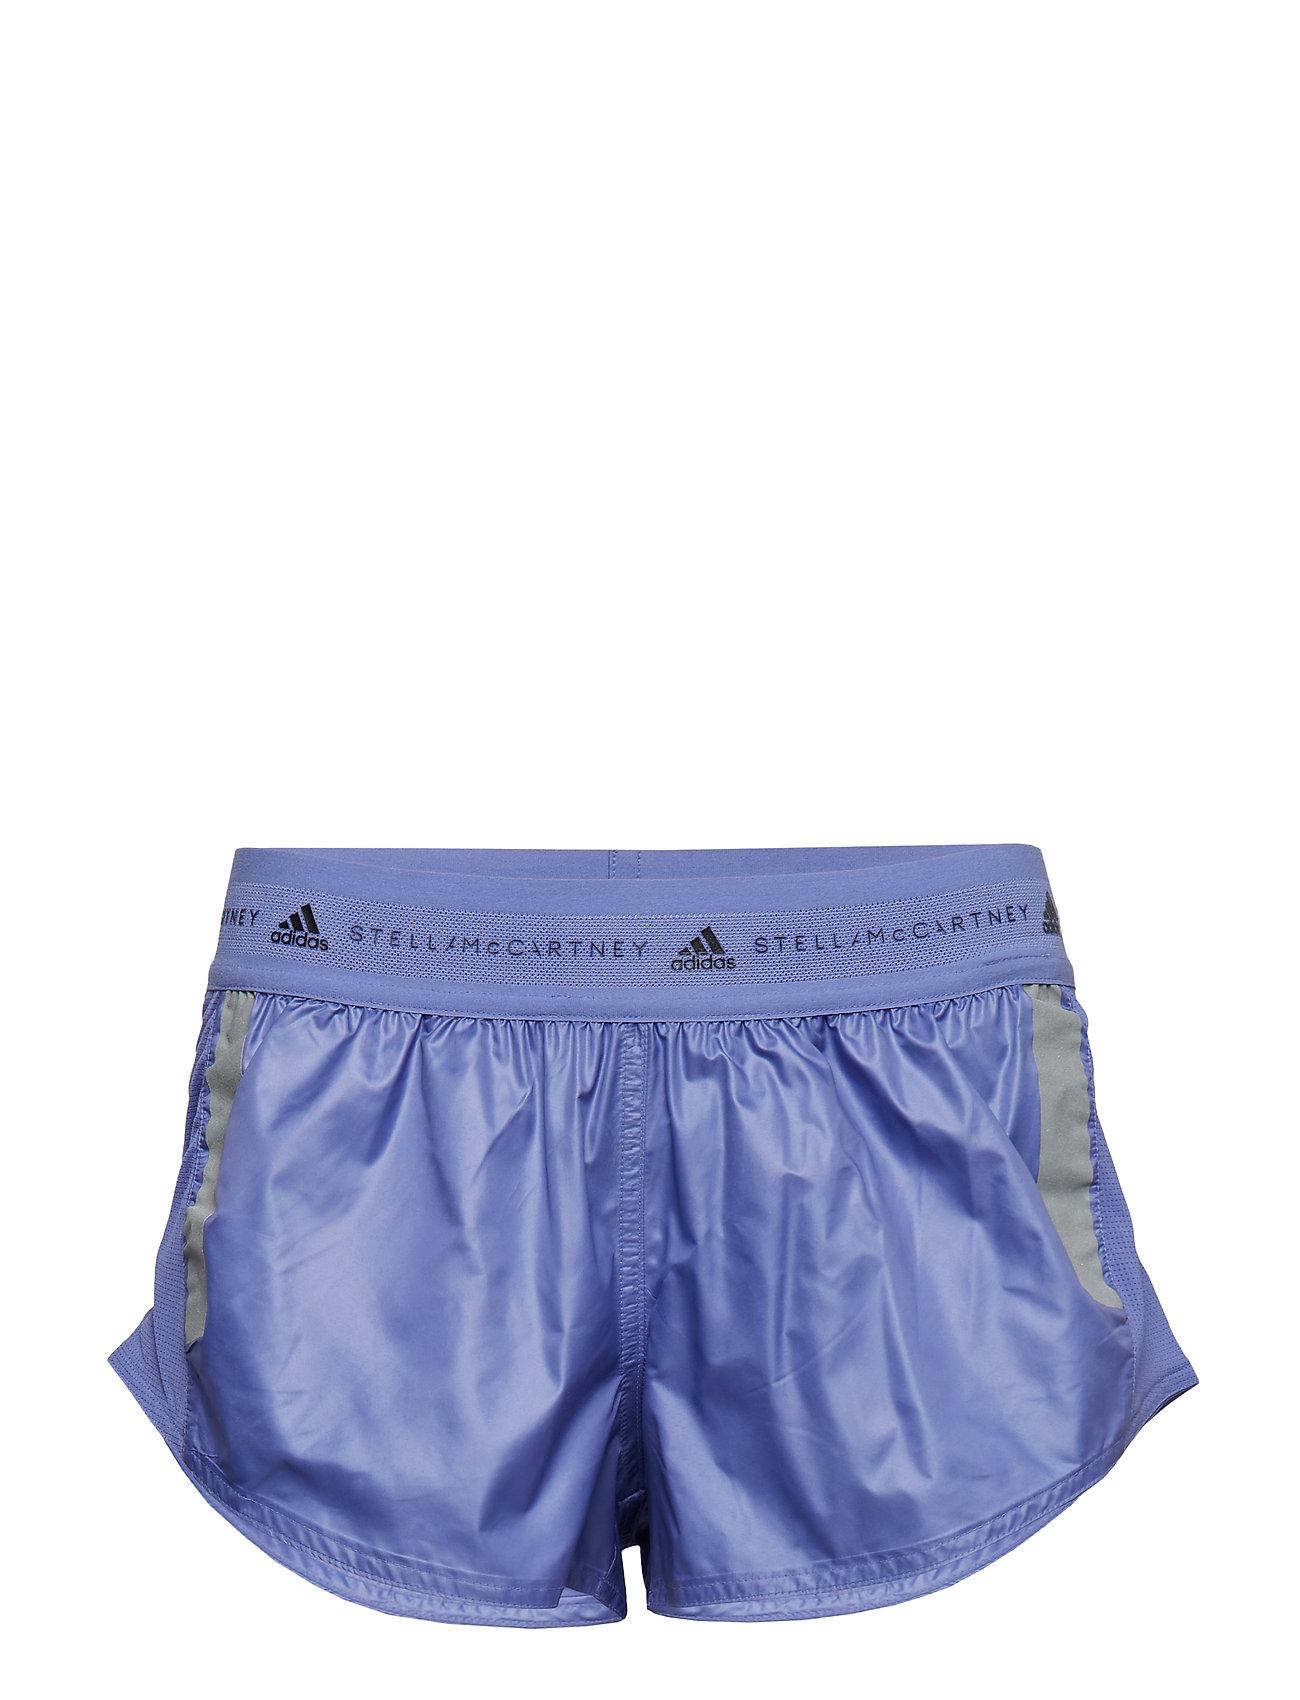 Adidas by Stella McCartney RUN AZ SHORT Shorts